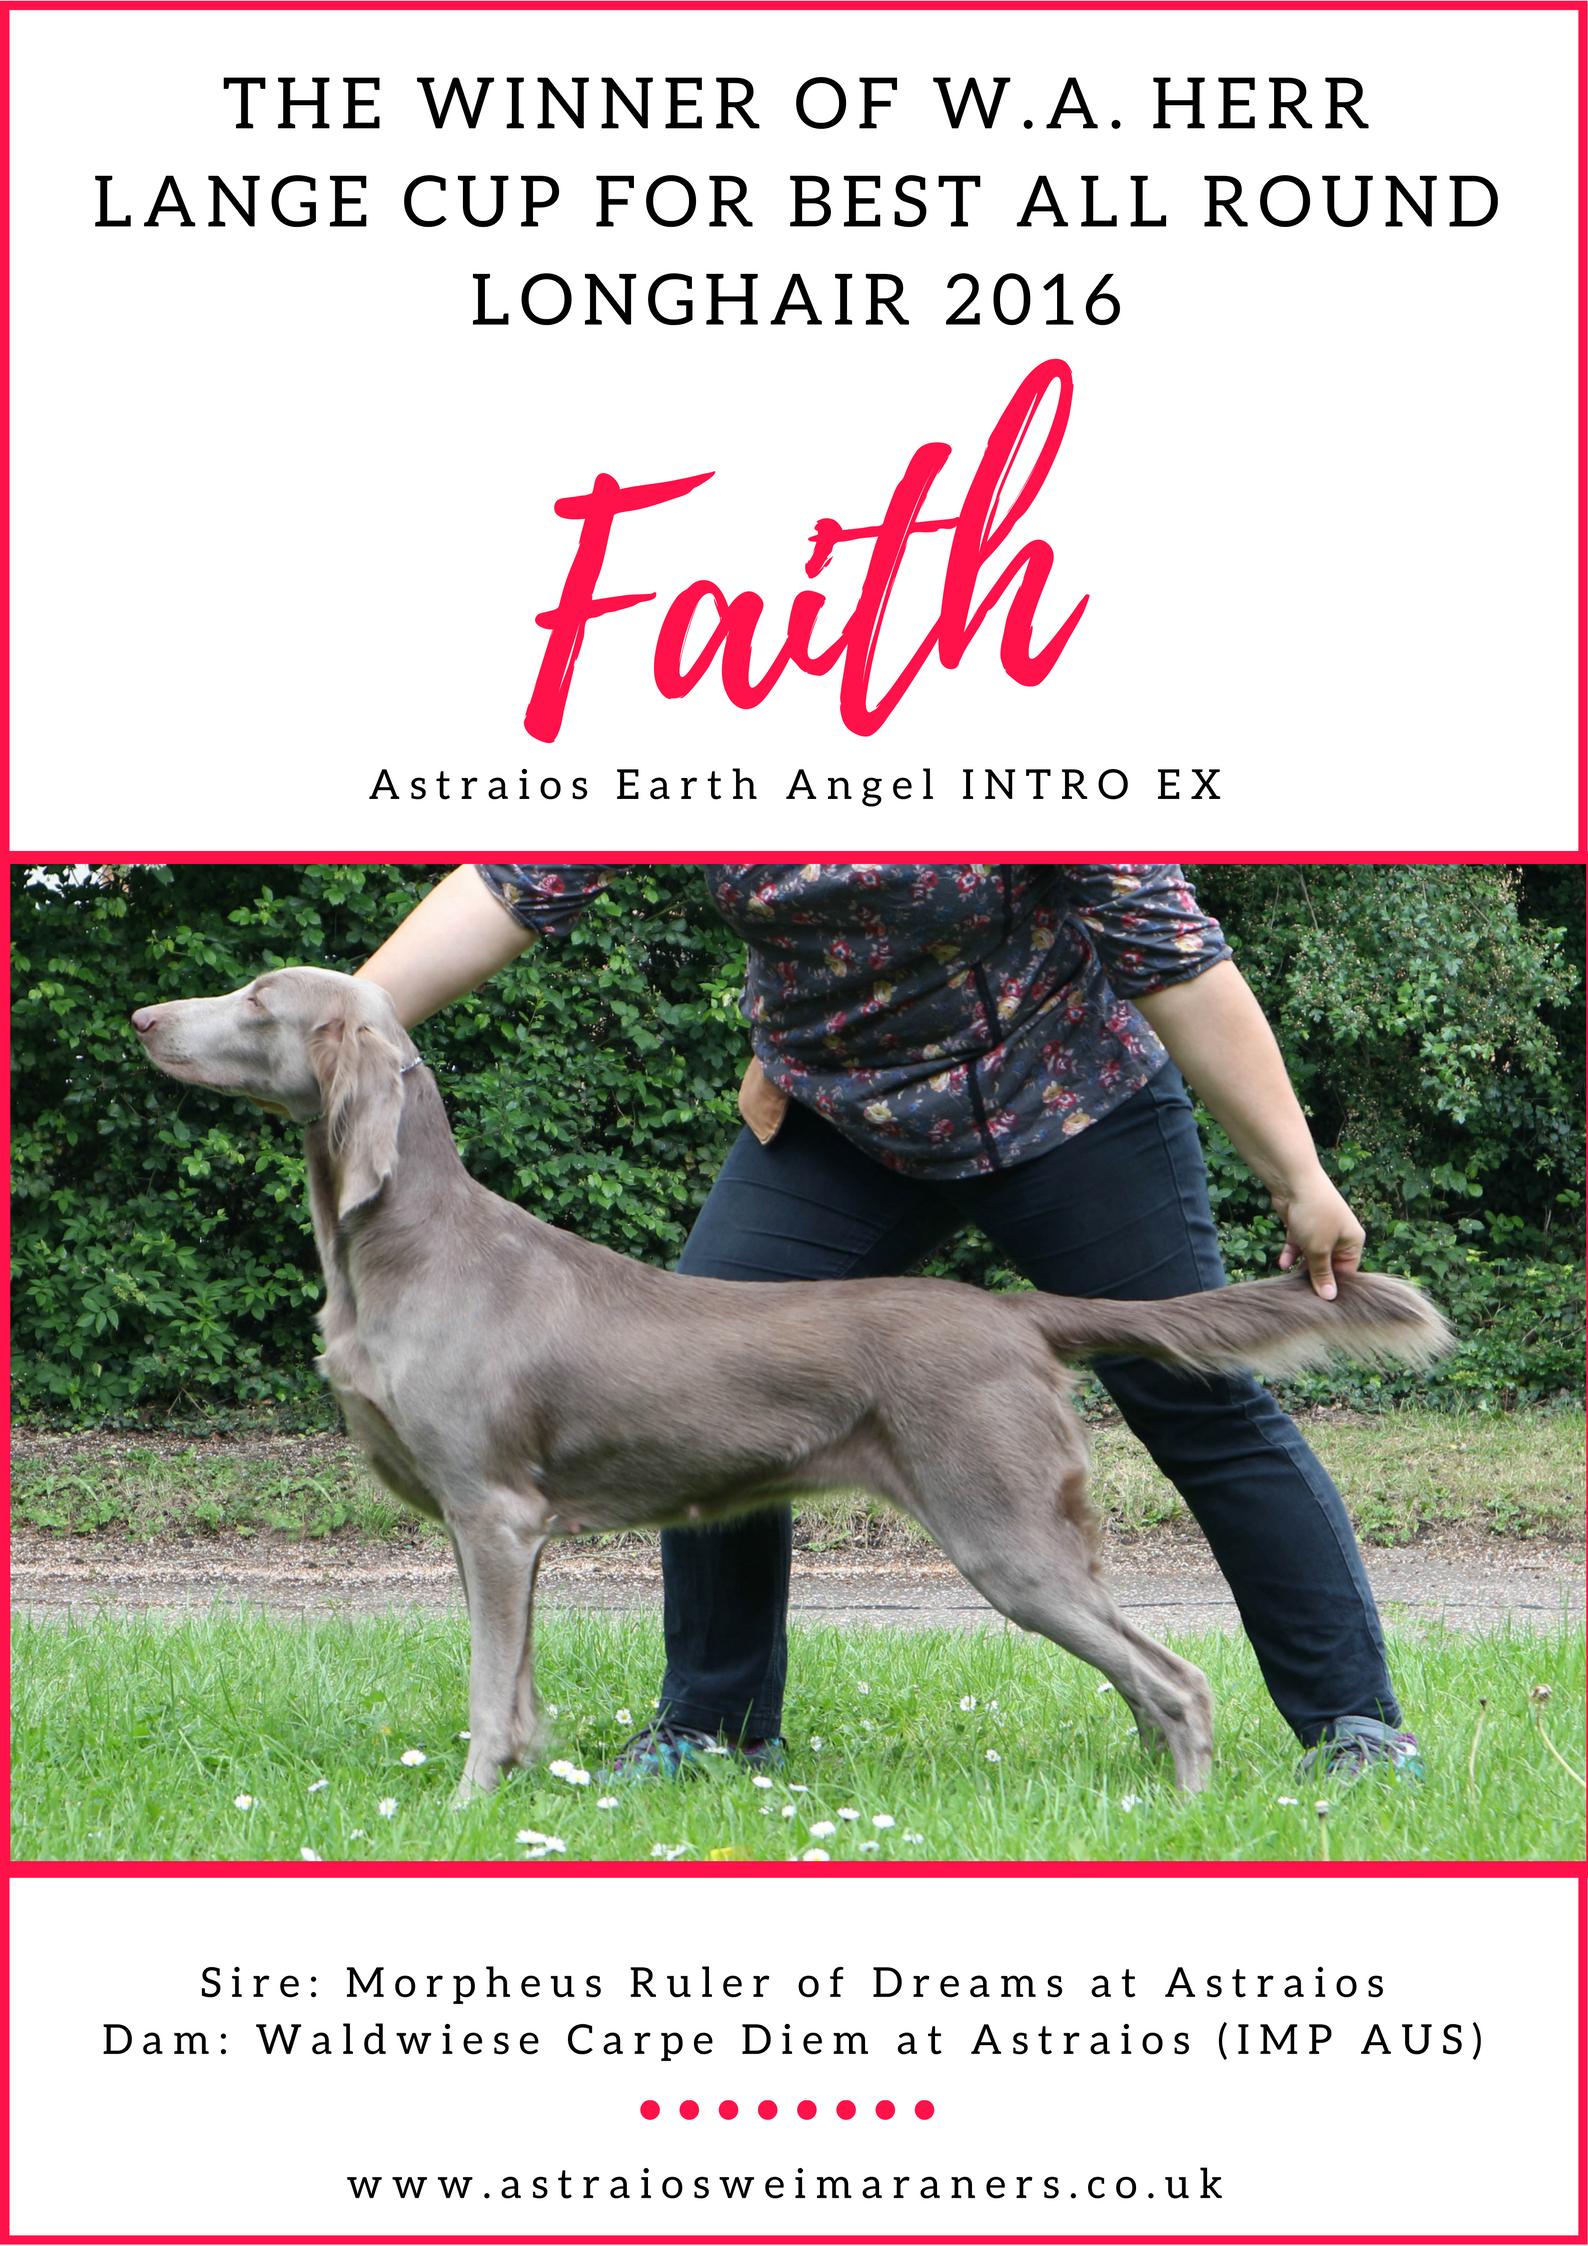 Herr Lange Cup 2016 – Faith (Astraios Earth Angel INTRO EX)